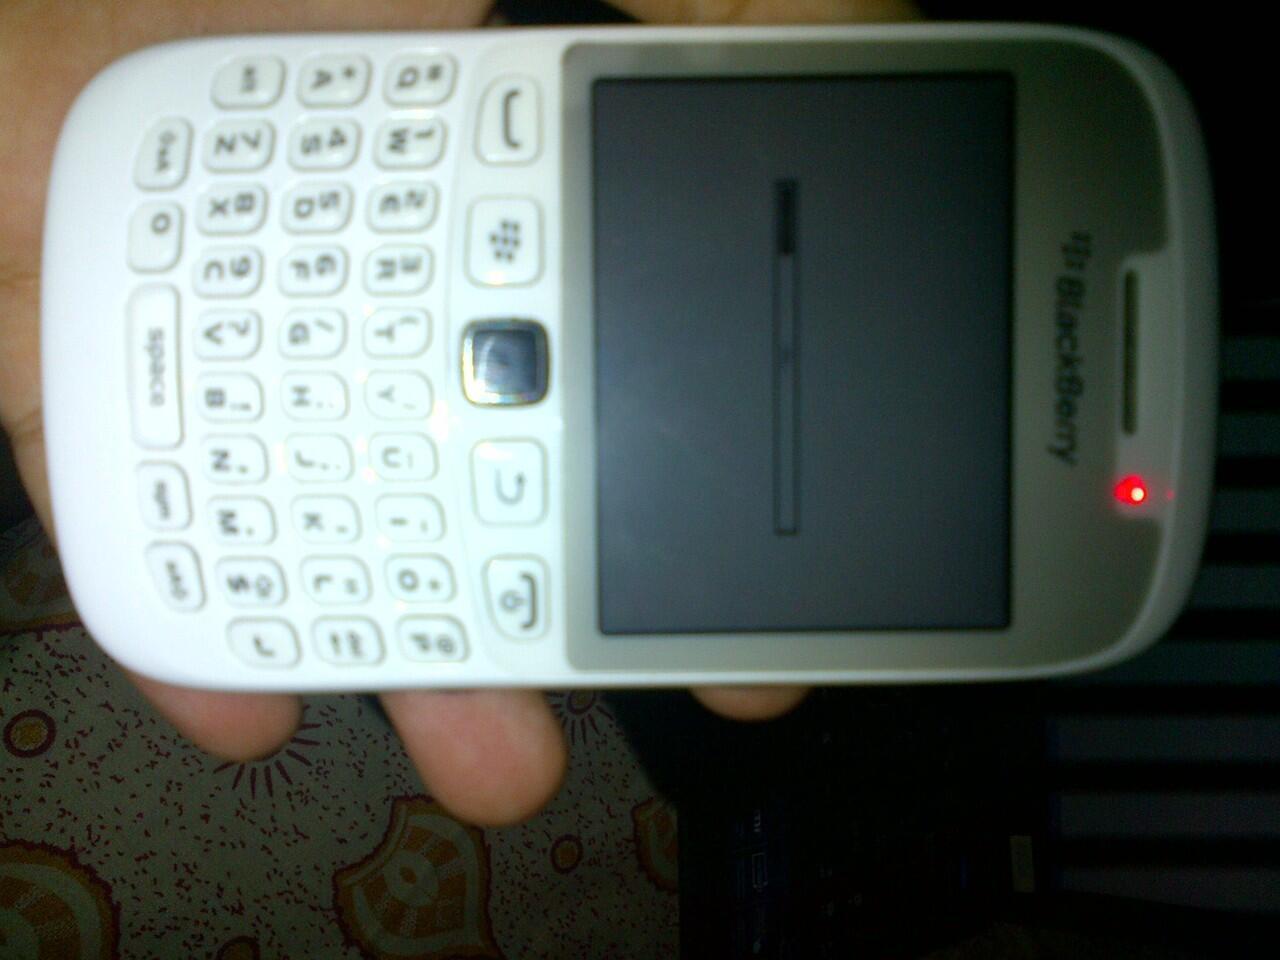 blackberry davis 9220 white blm ada 1bln pke, gansi ss, gress 98%